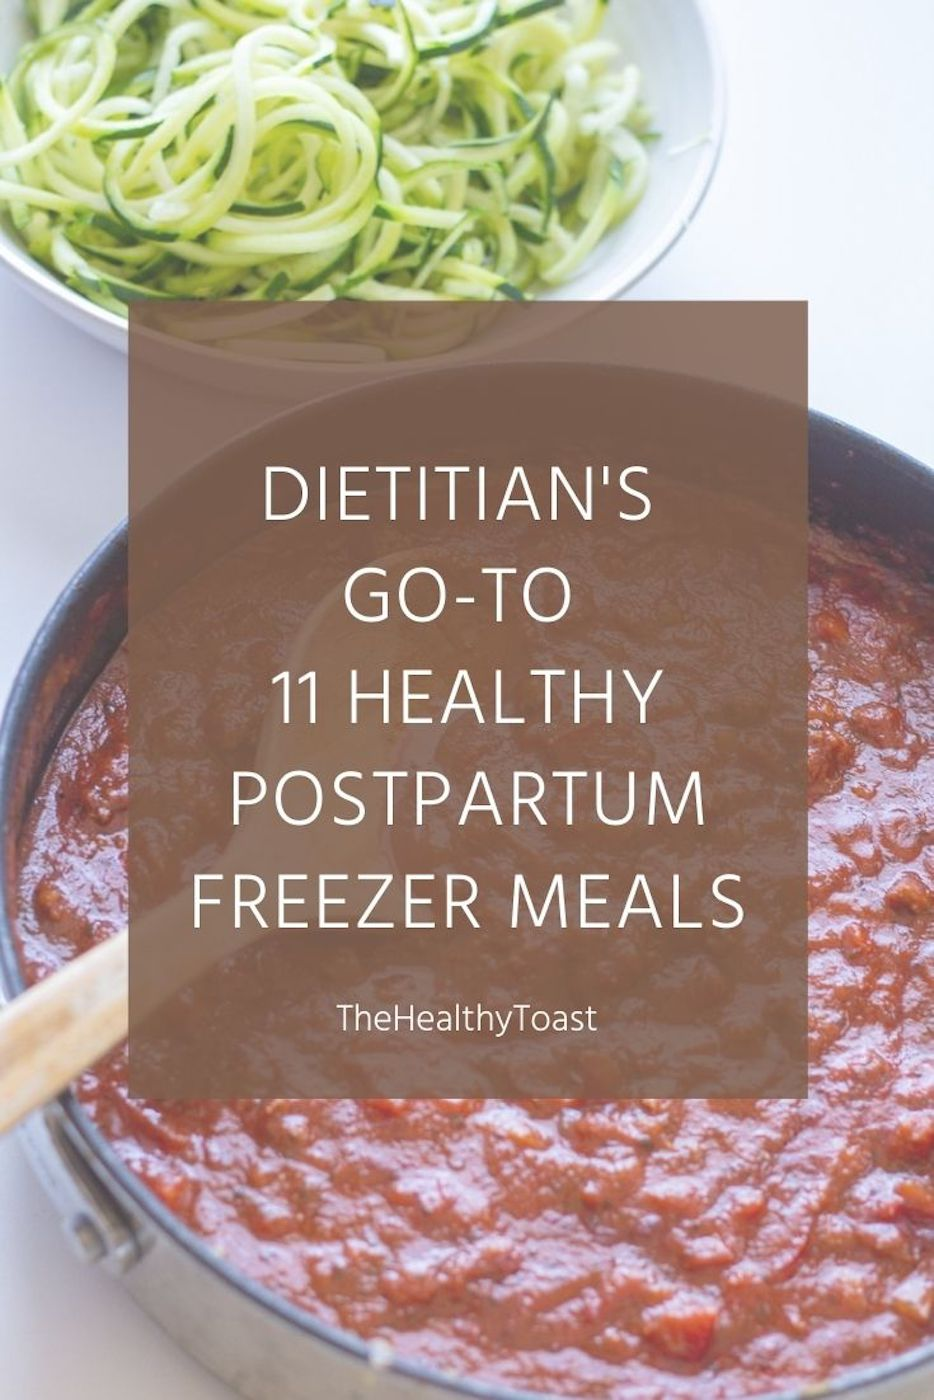 11 Healthy Postpartum Freezer Meals